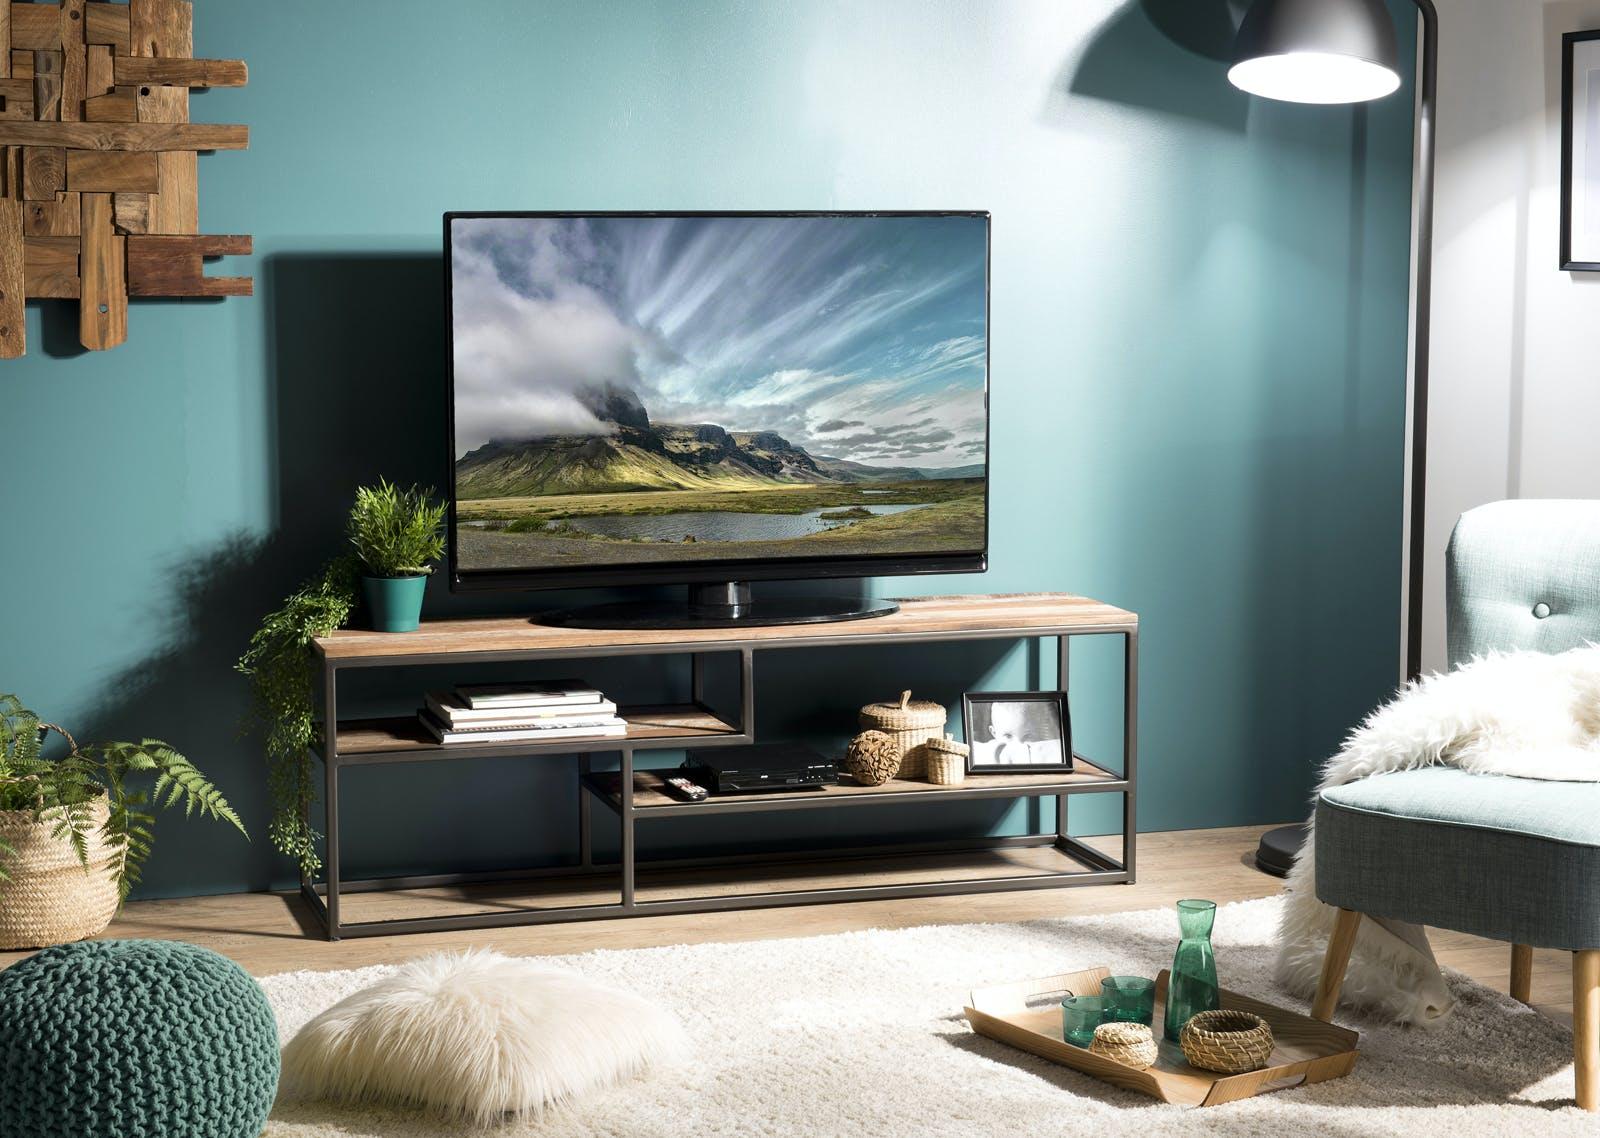 Banc tv teck recyclé SWING